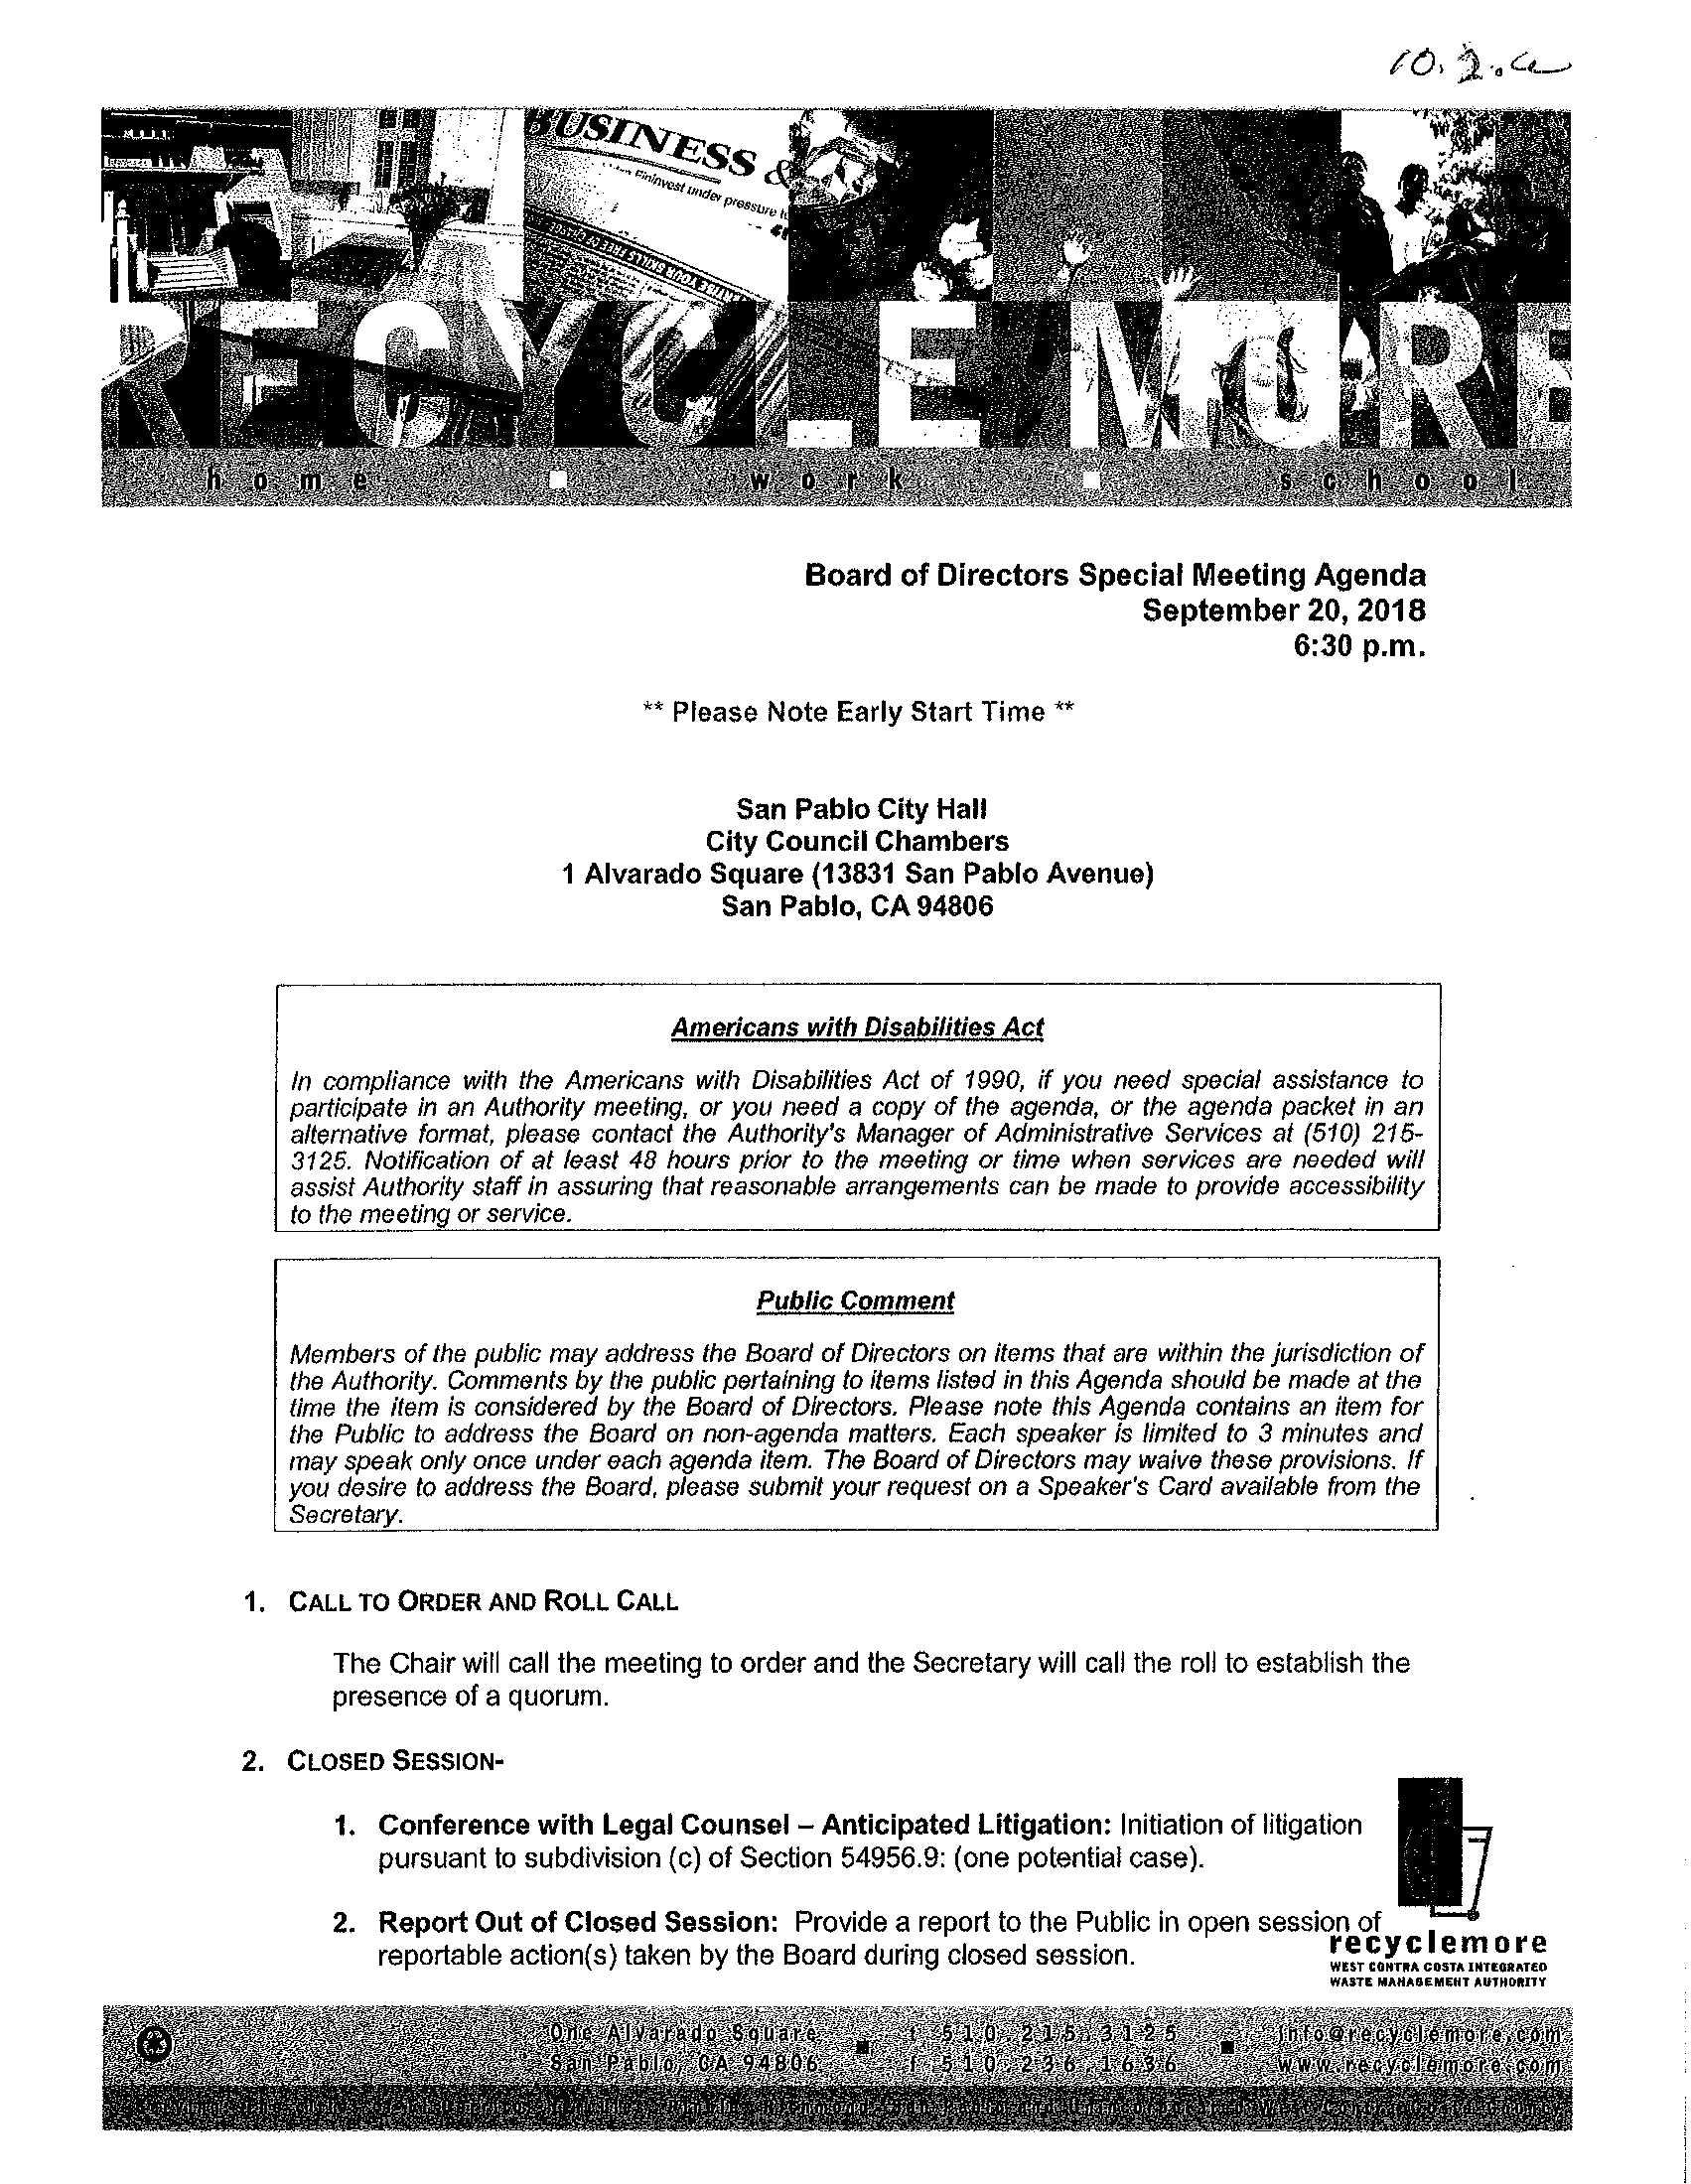 ESMAC Agenda 10.10.2018 (32 Pages)_17.jpg